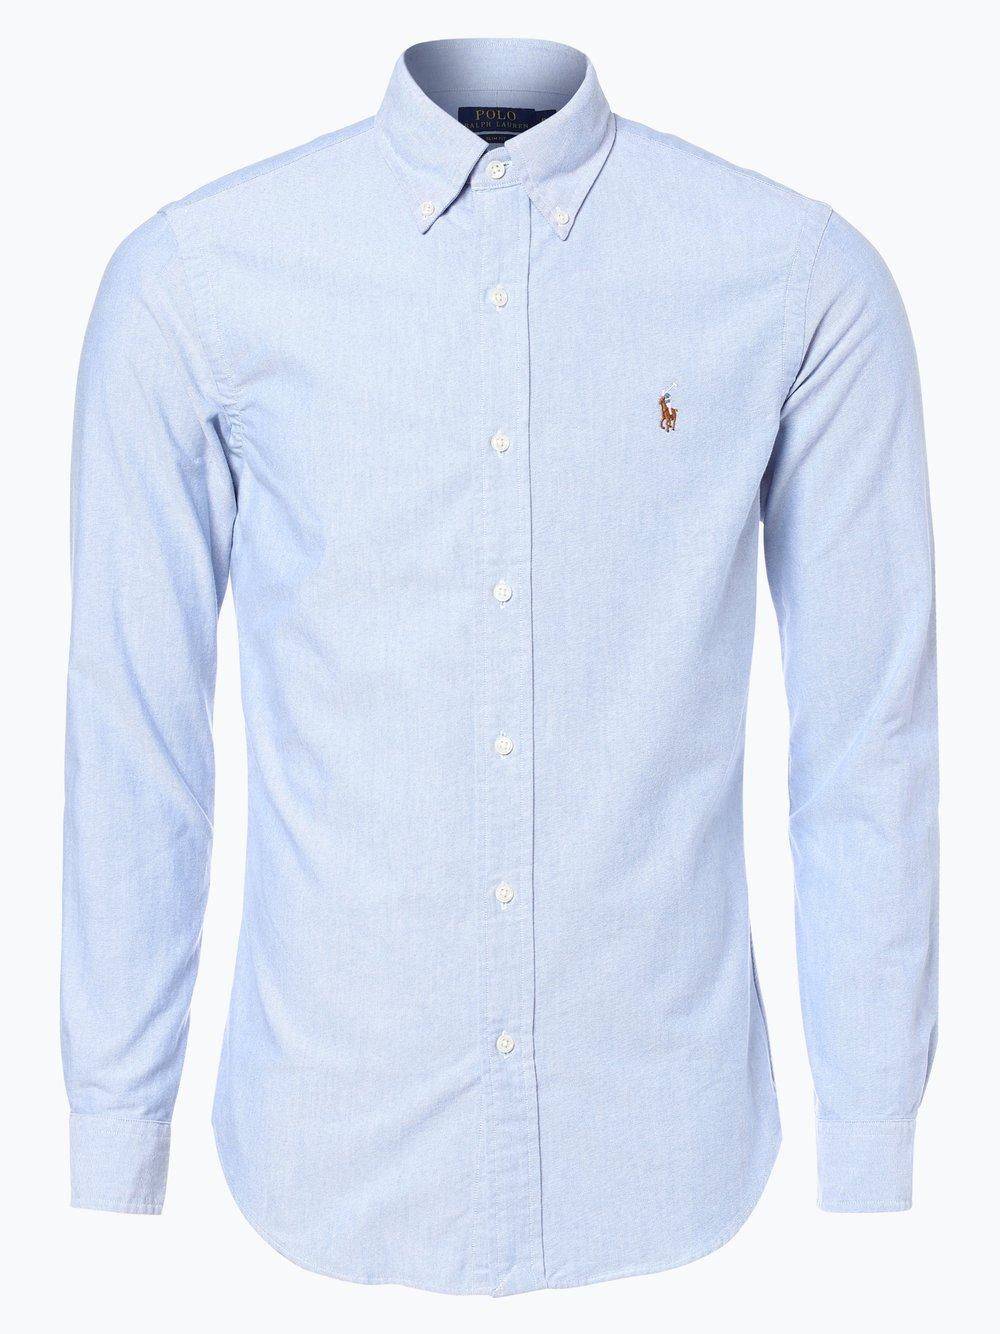 db07e60c183648 Polo Ralph Lauren Herren Hemd Slim Fit online kaufen